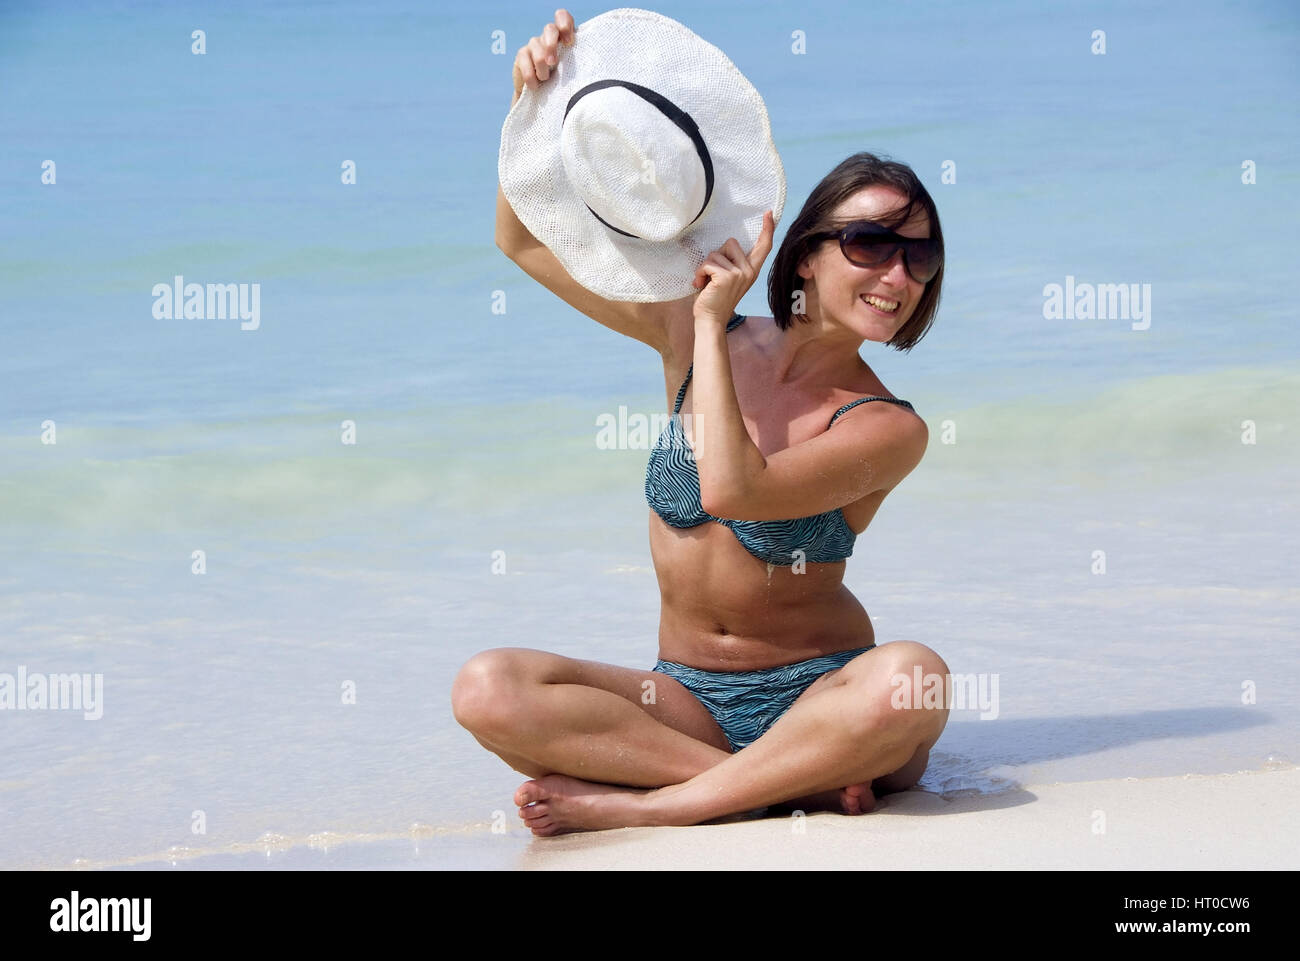 Junge Frau im am Meeresufer Bikini - mujer joven en la playa Foto de stock